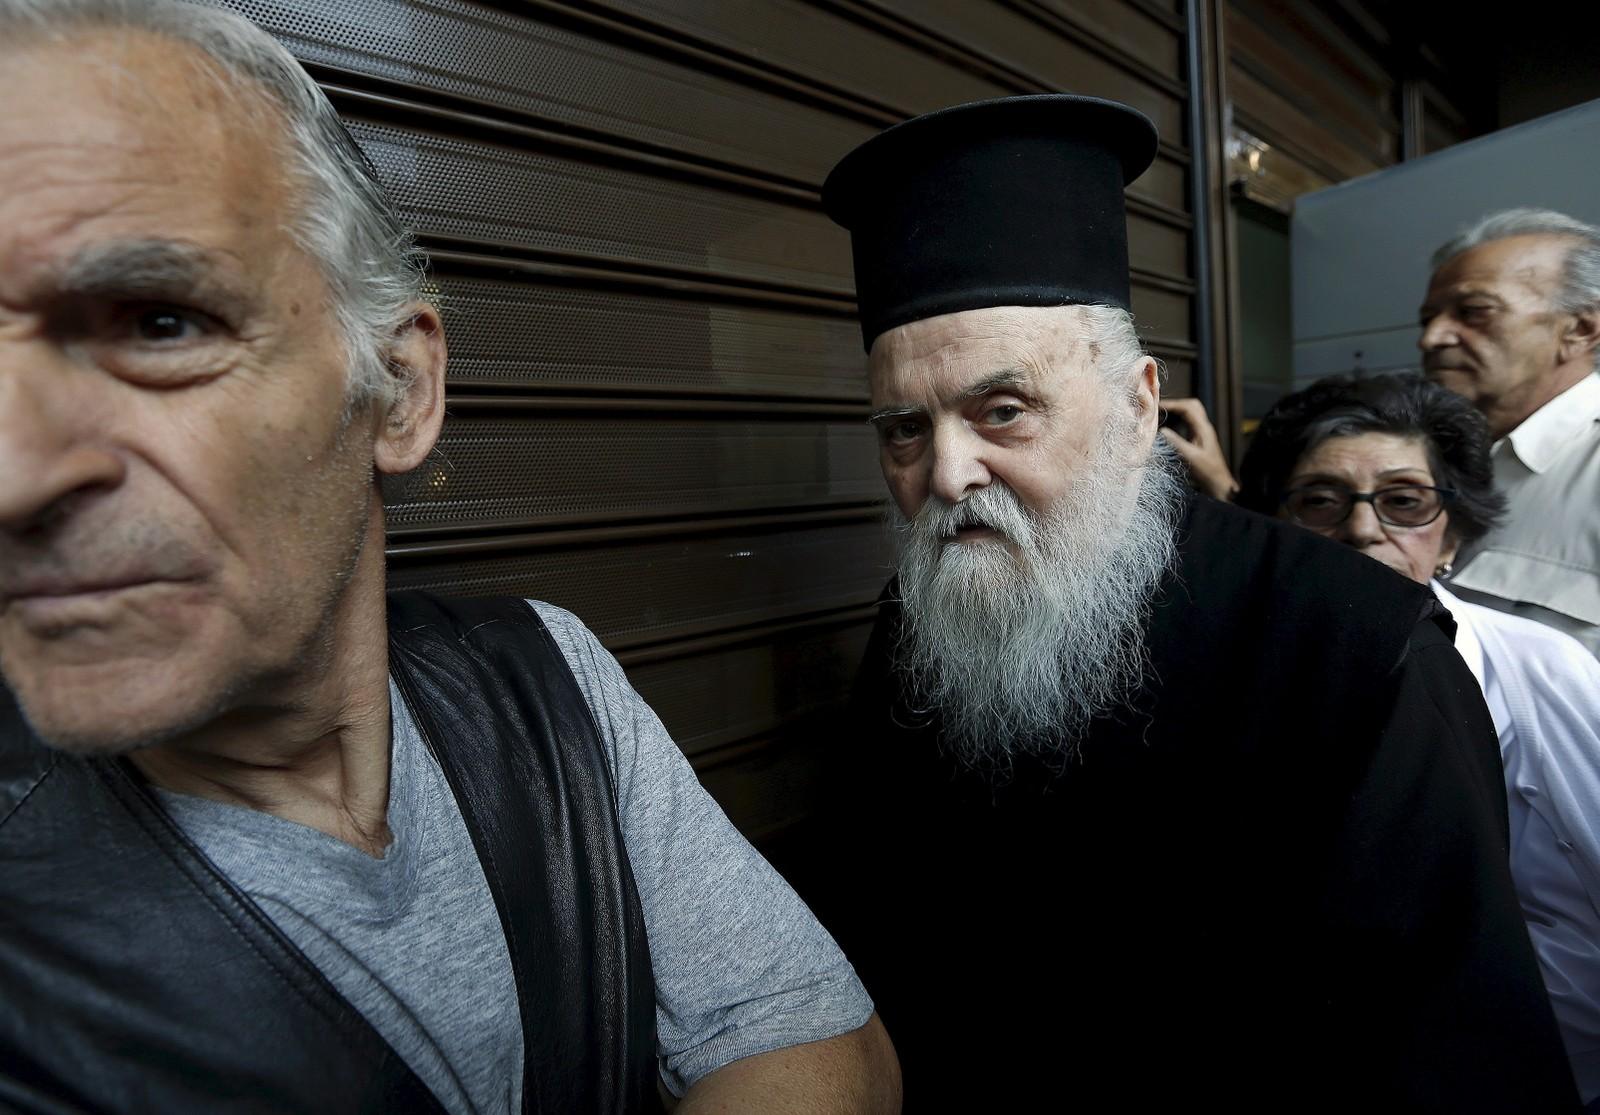 Den gresk-ortodokse presten, fader Theiklitos (77), venter i kø sammen med mange andre pensjonister utenfor en Alpha Bank i Aten.